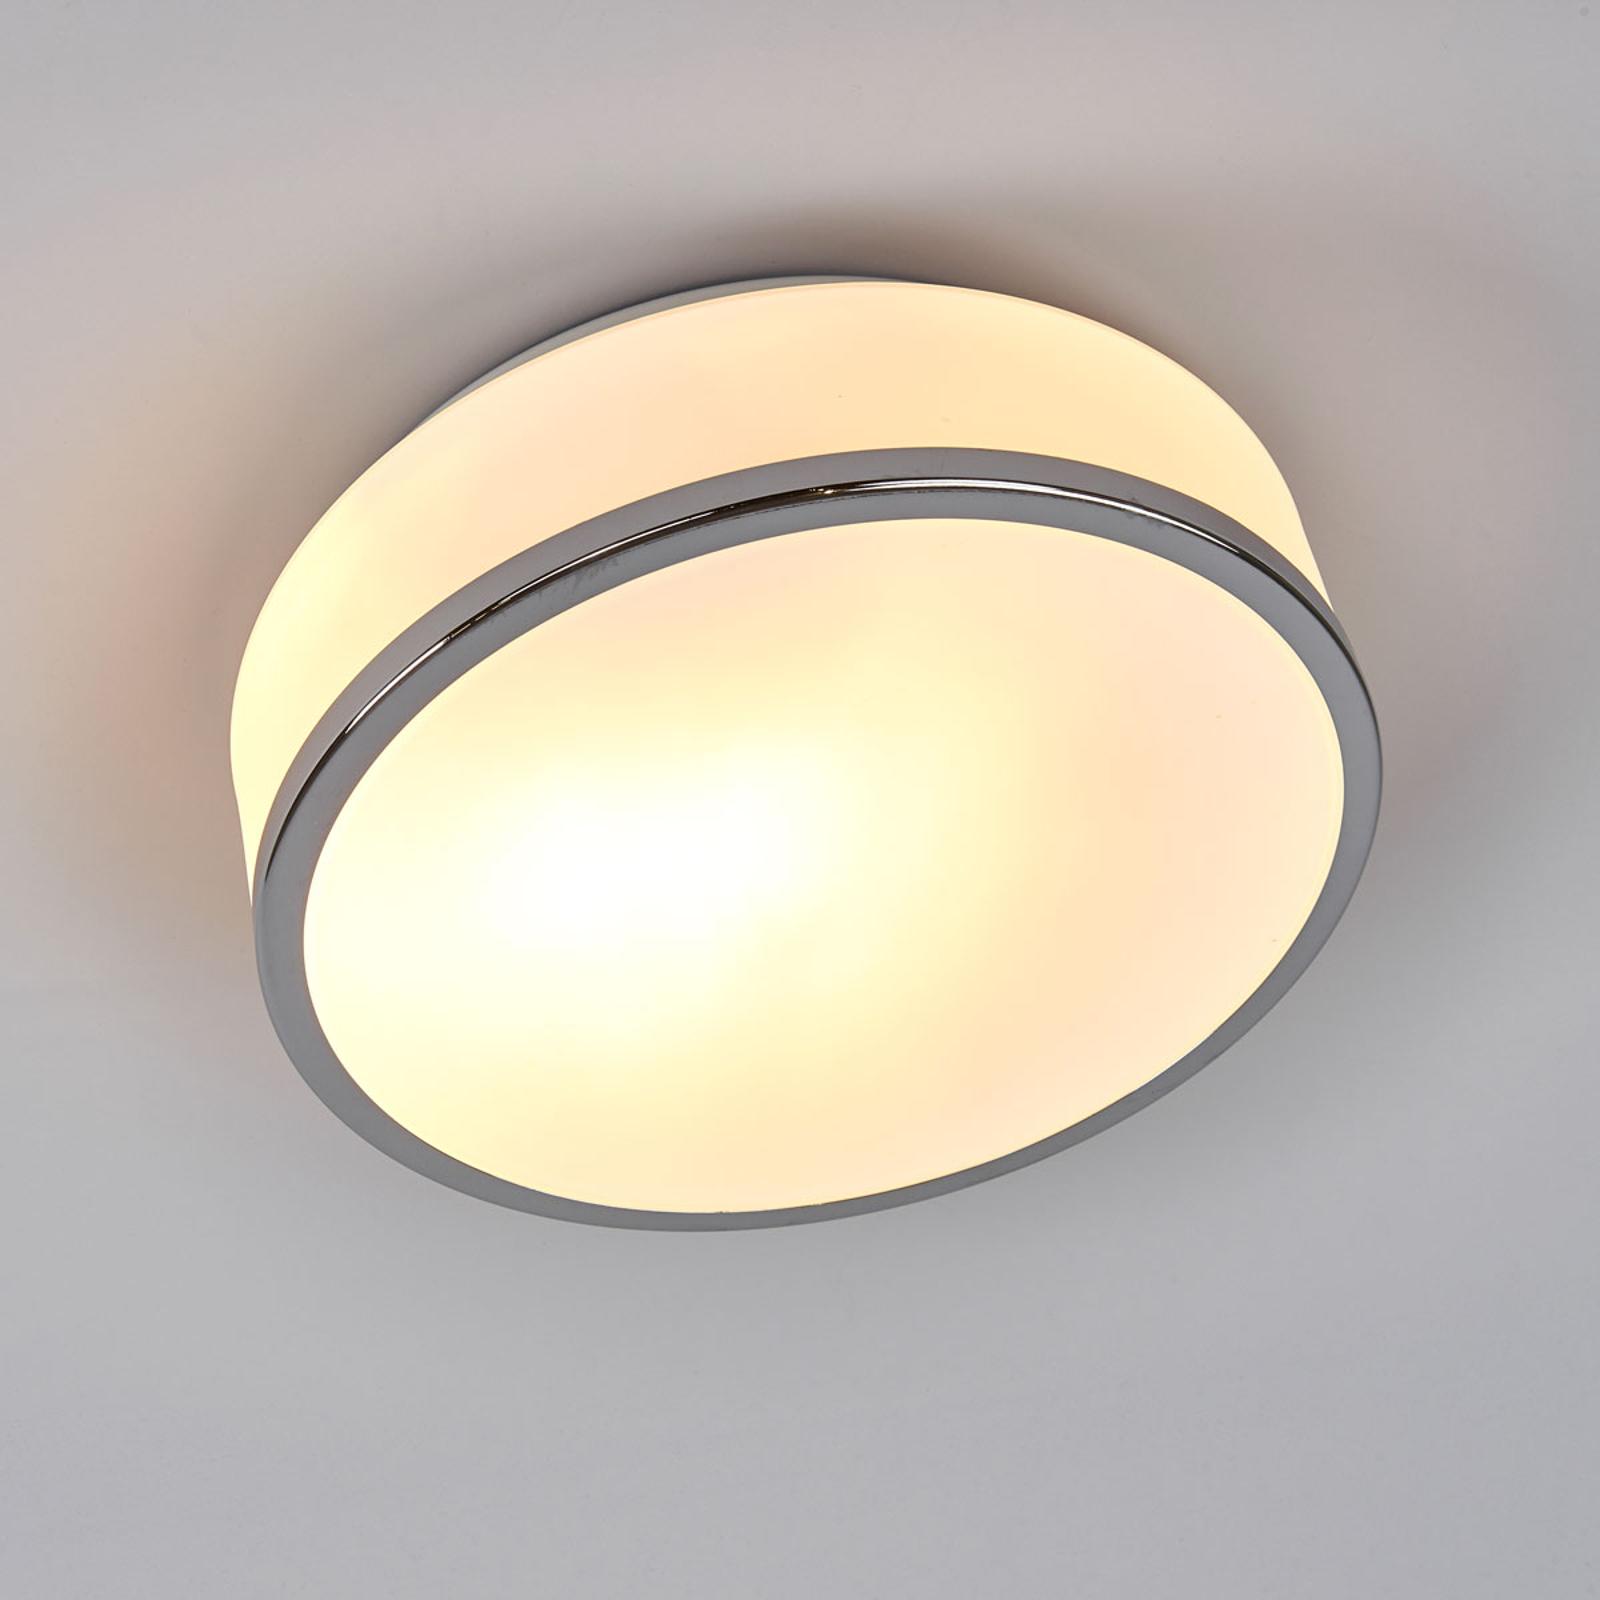 Lampa sufitowa Flush IP44, Ø 23 cm, srebrna